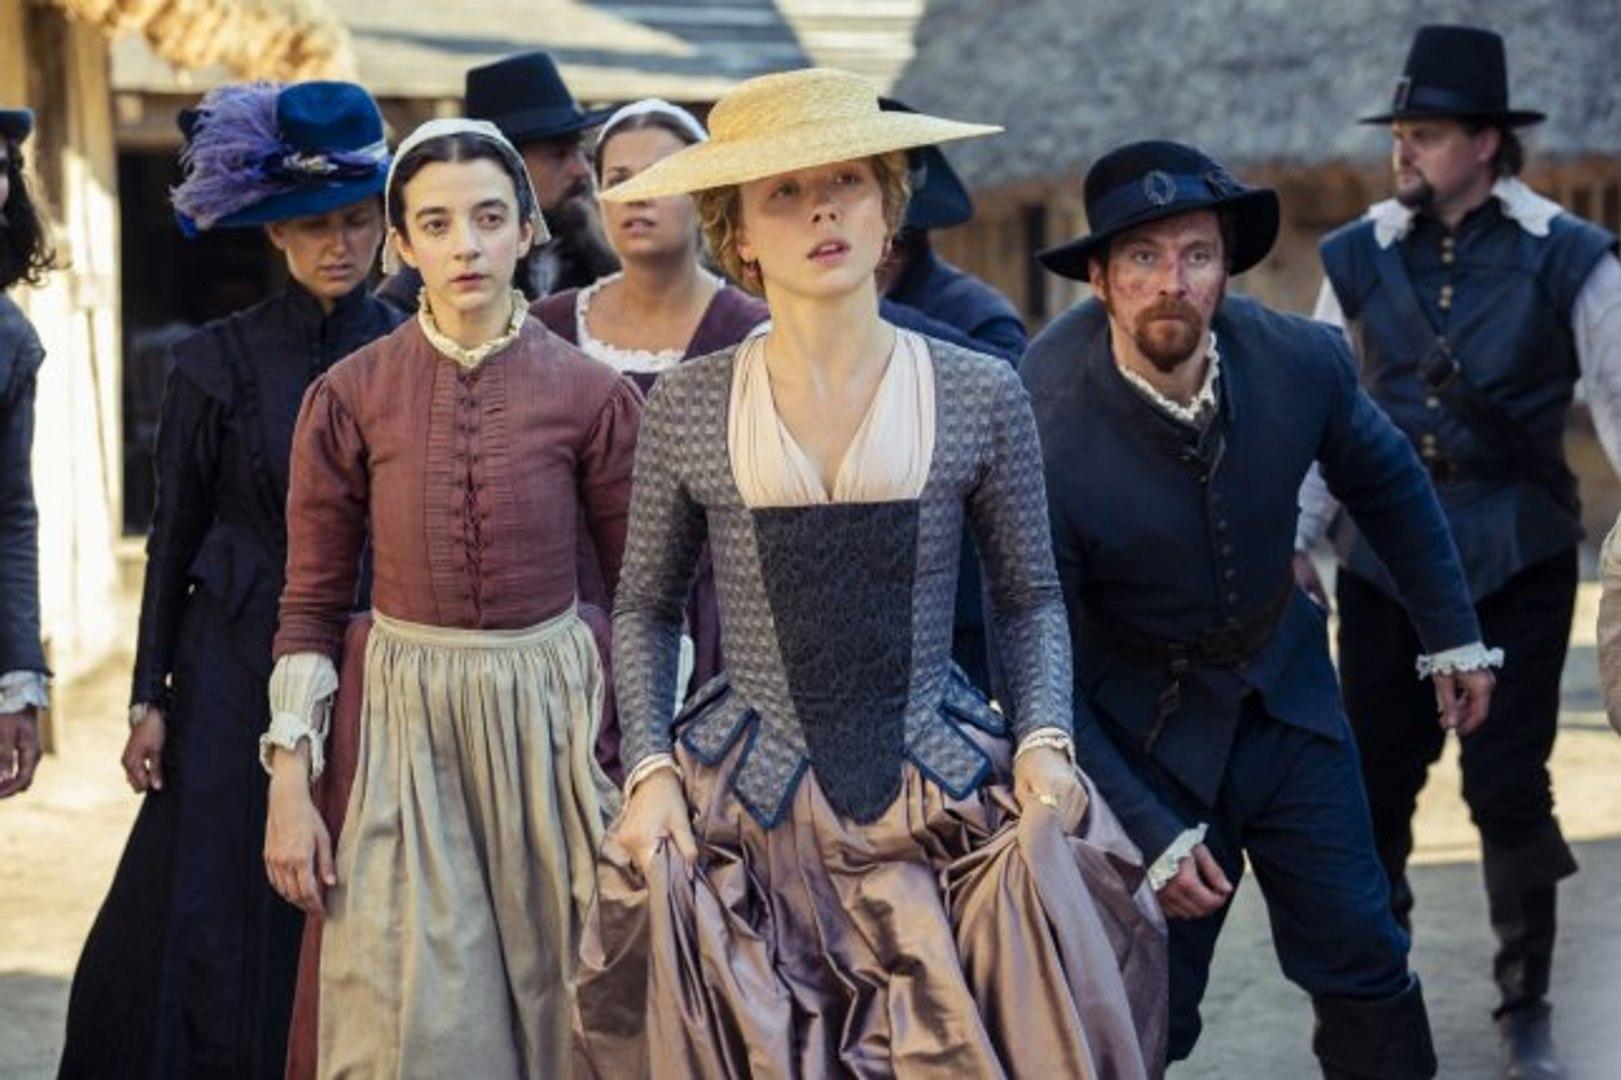 Jamestown Season 3 Episode 1: Episode 1